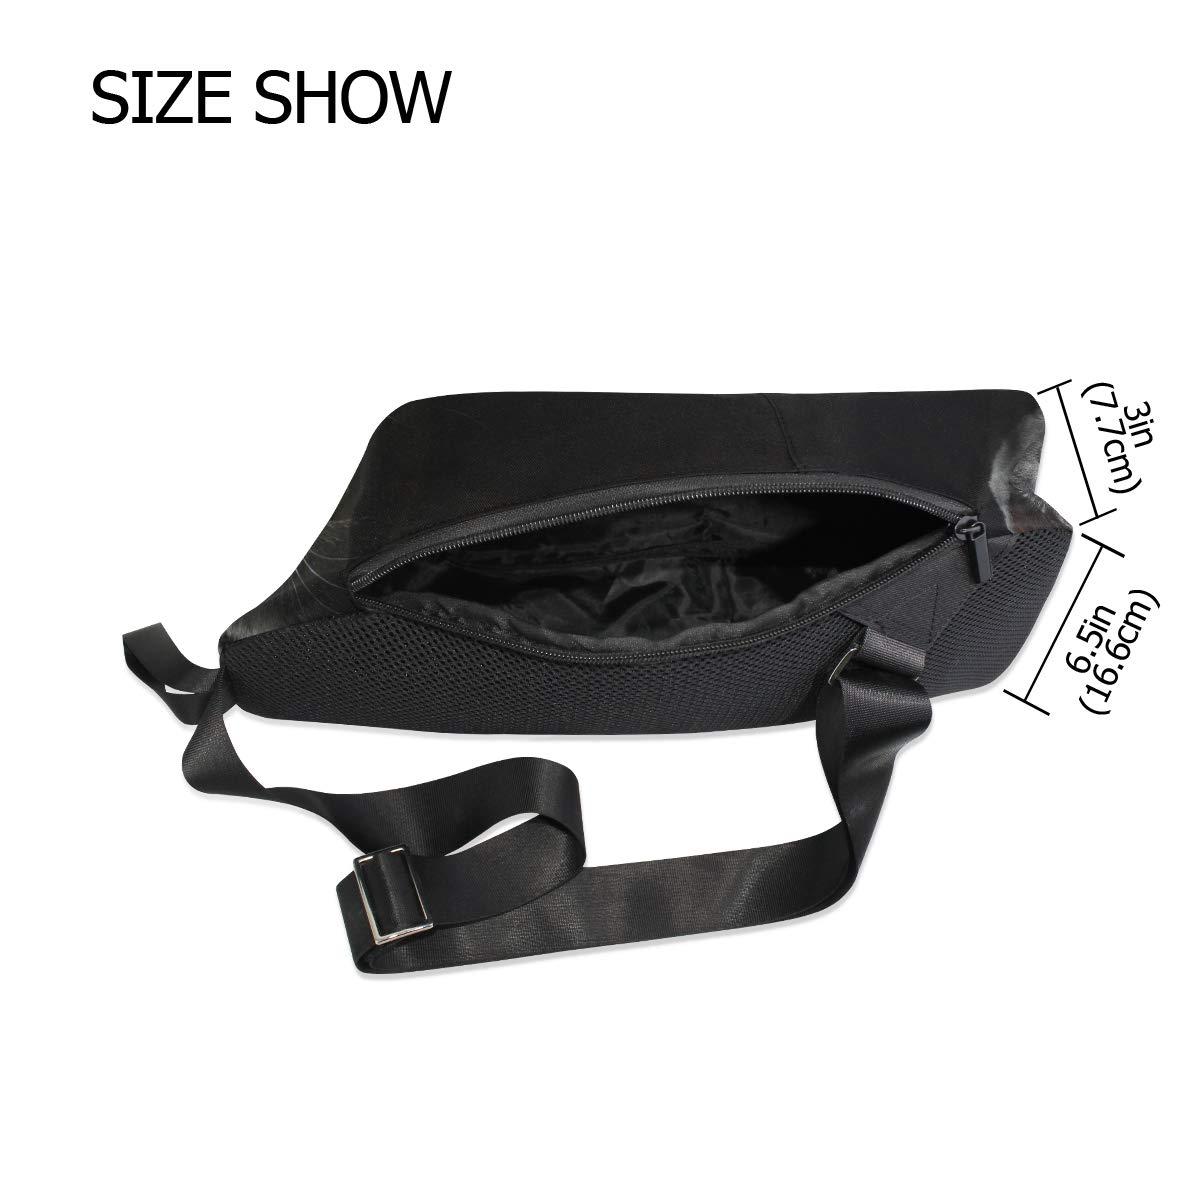 AHOMY Cat Messenger Bag Small Travel School Sling Bag Crossbody Bag